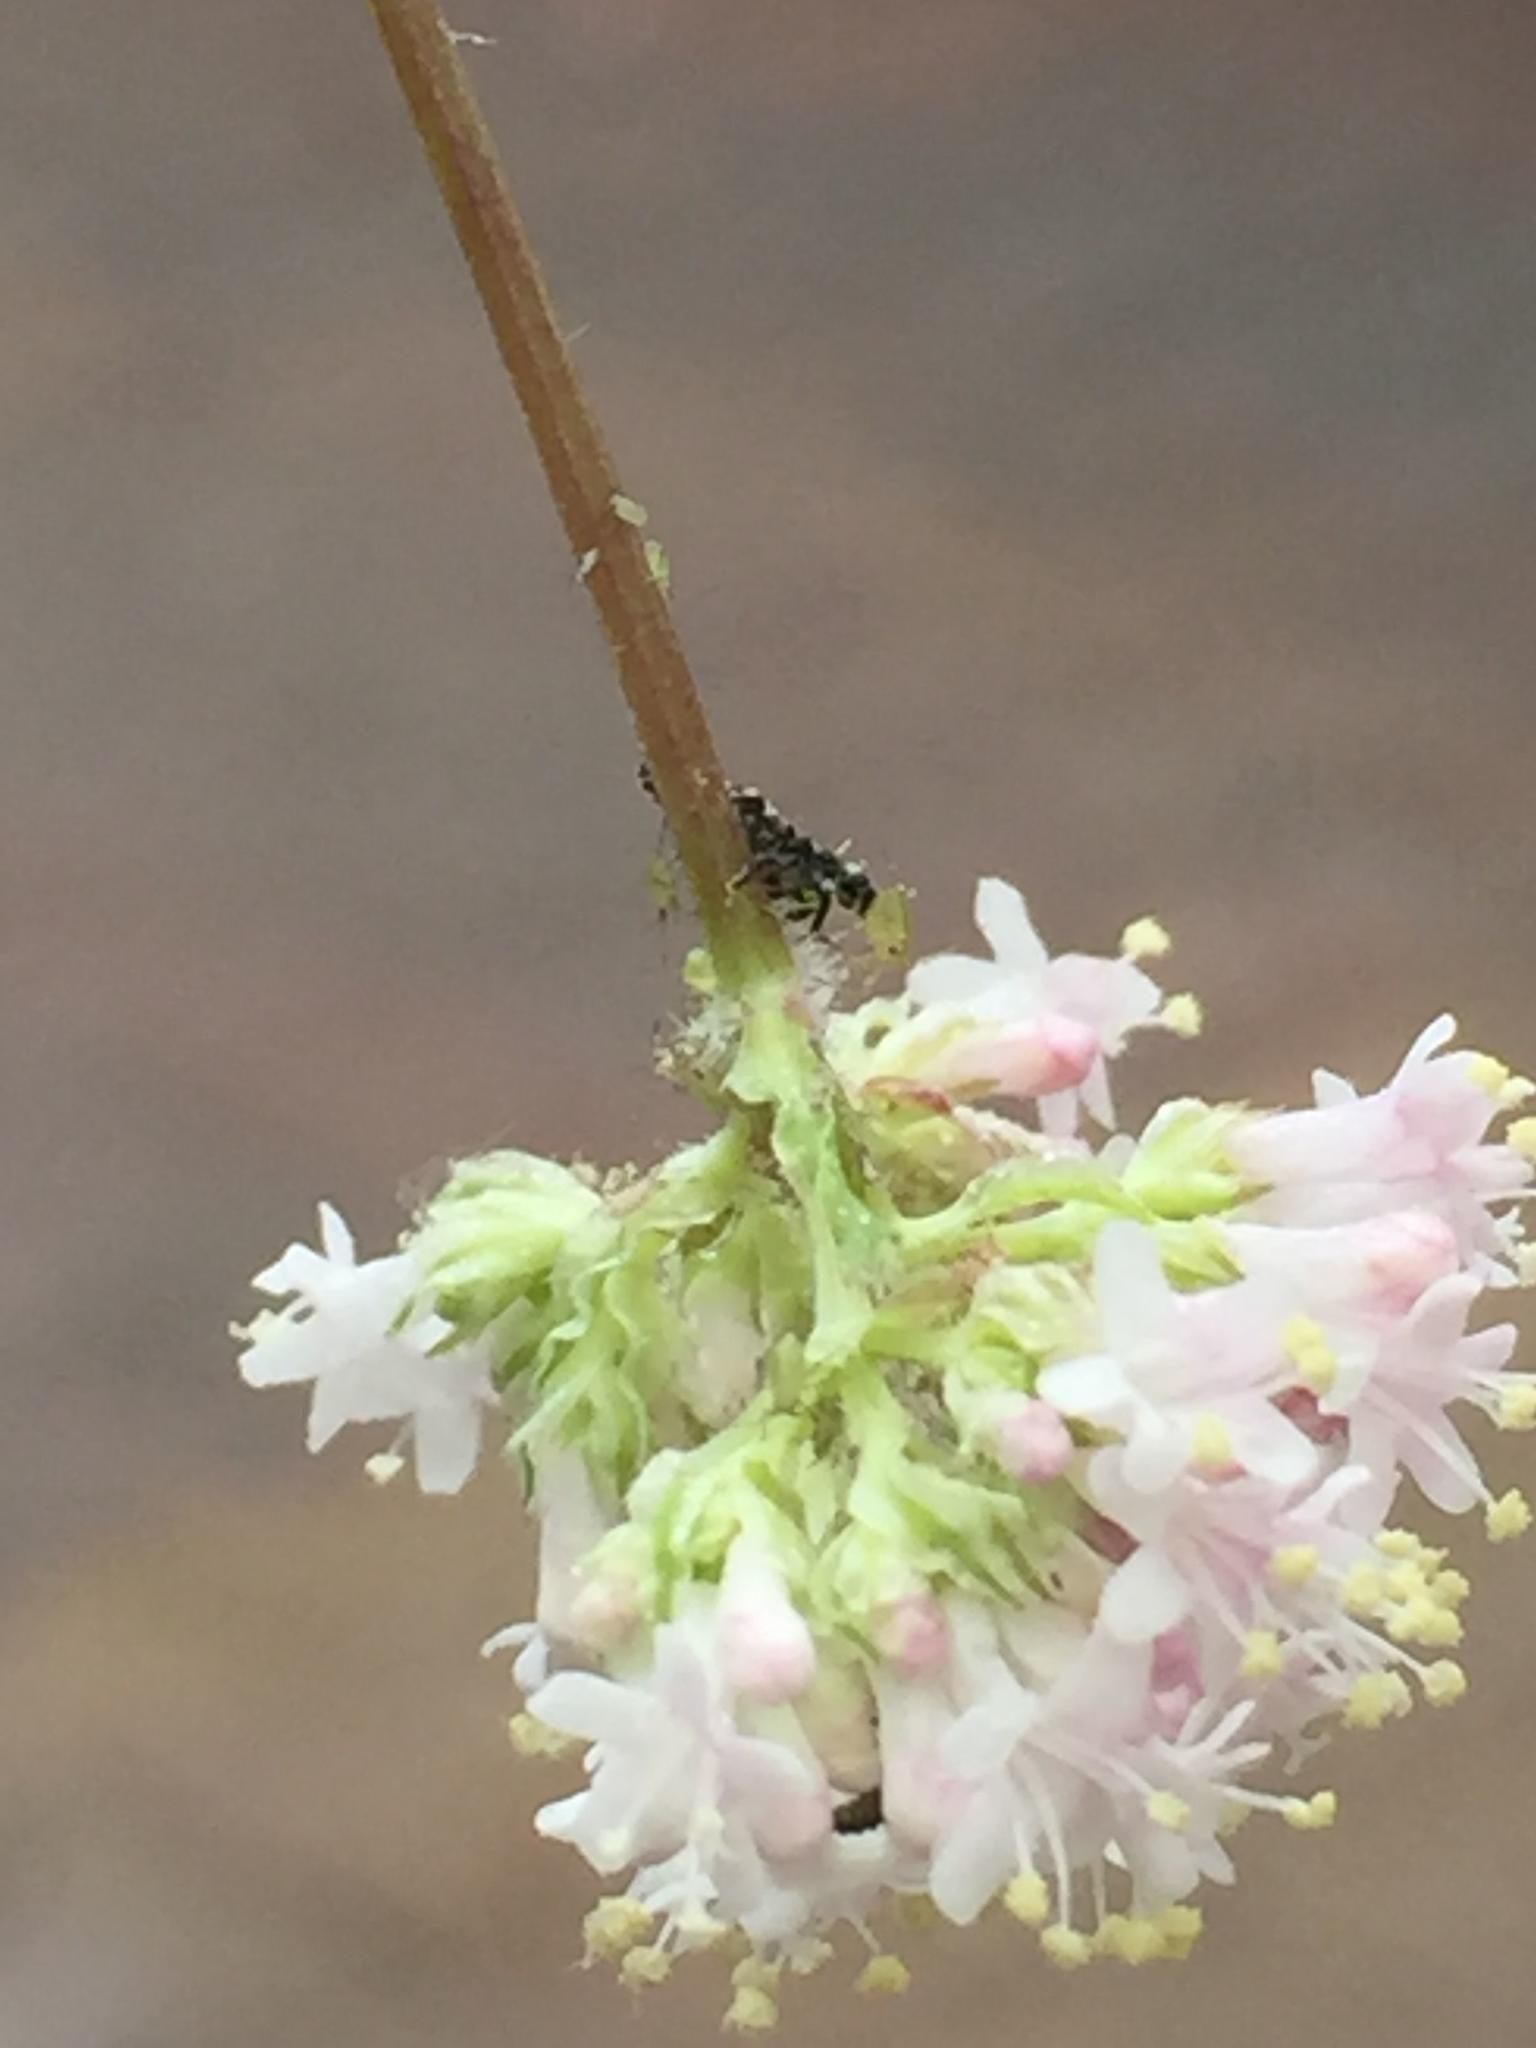 larve van lieveheersbeestjes op bloem met luis